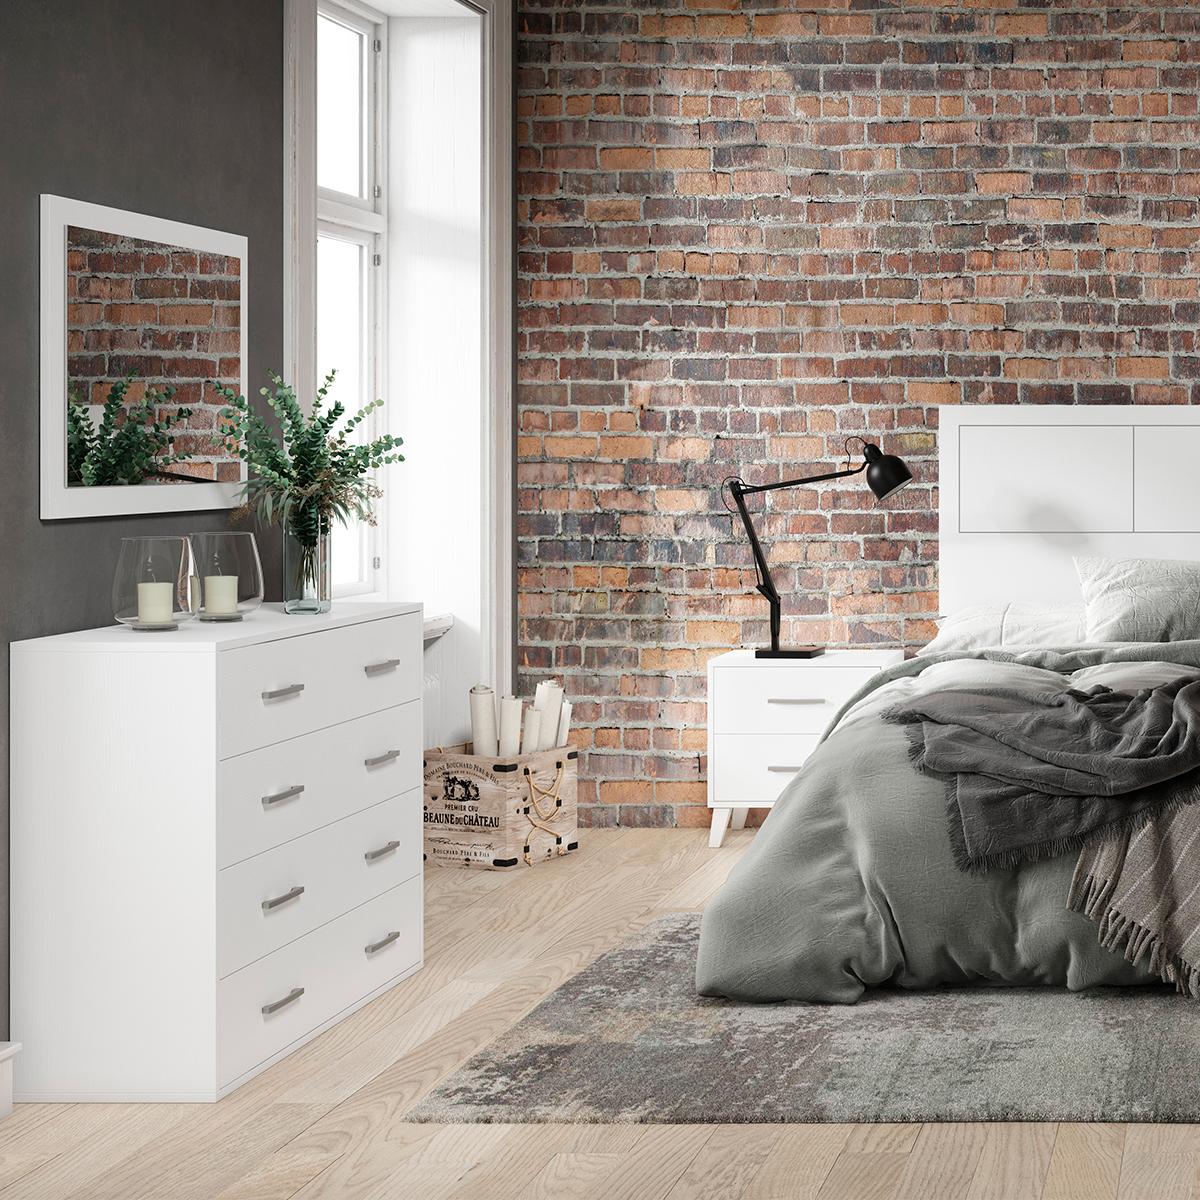 Dormitorio de matrimonio New Plus 01 comoda y espejo